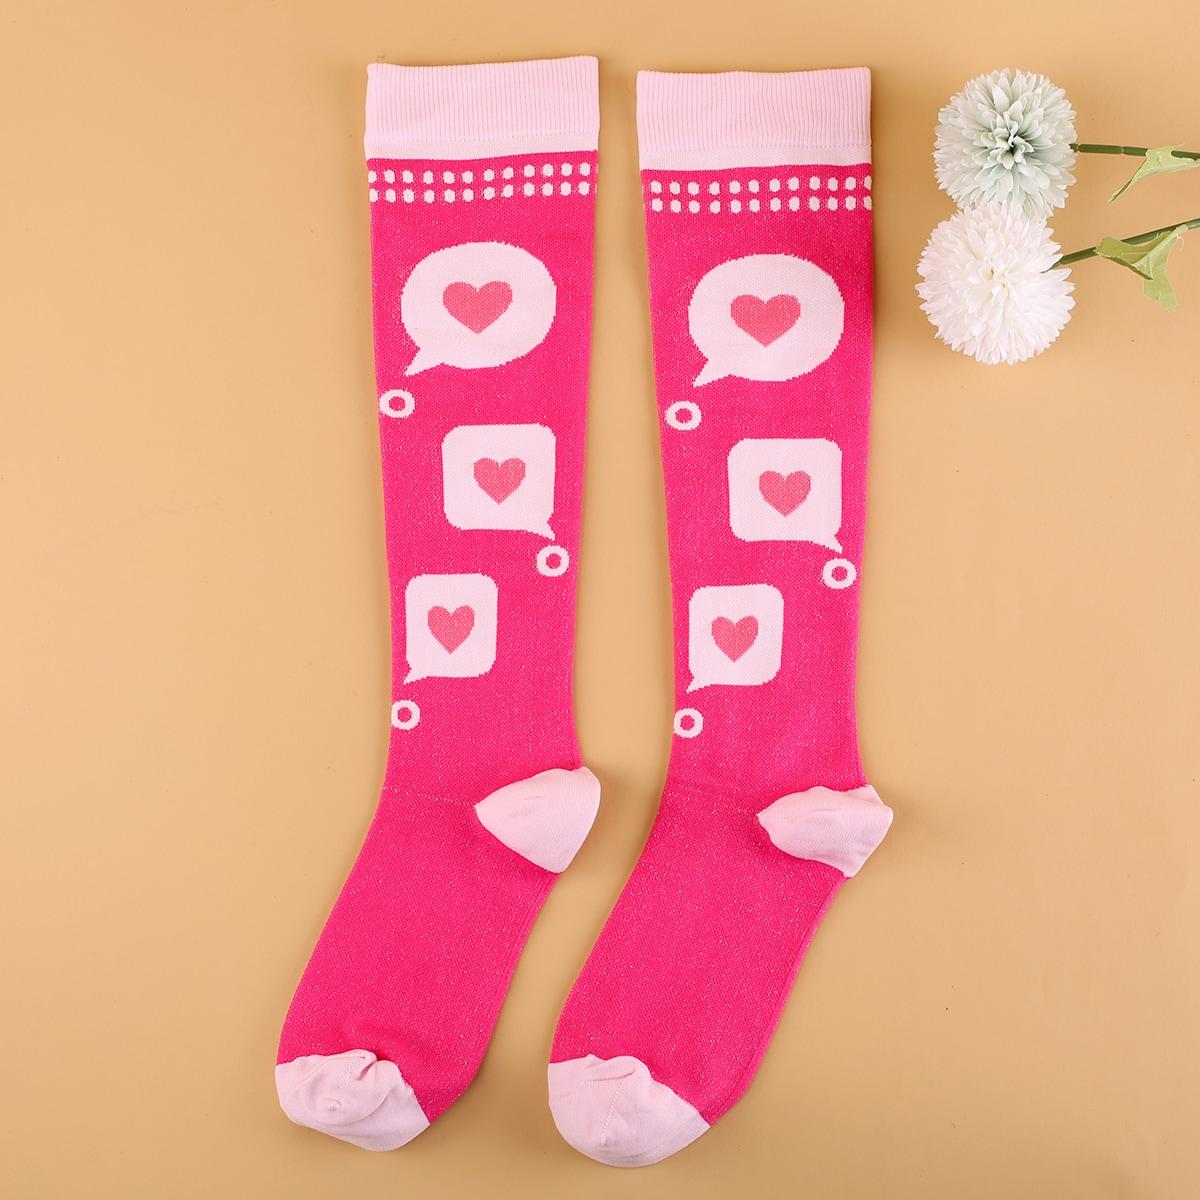 Носки выше голени с узором сердечка